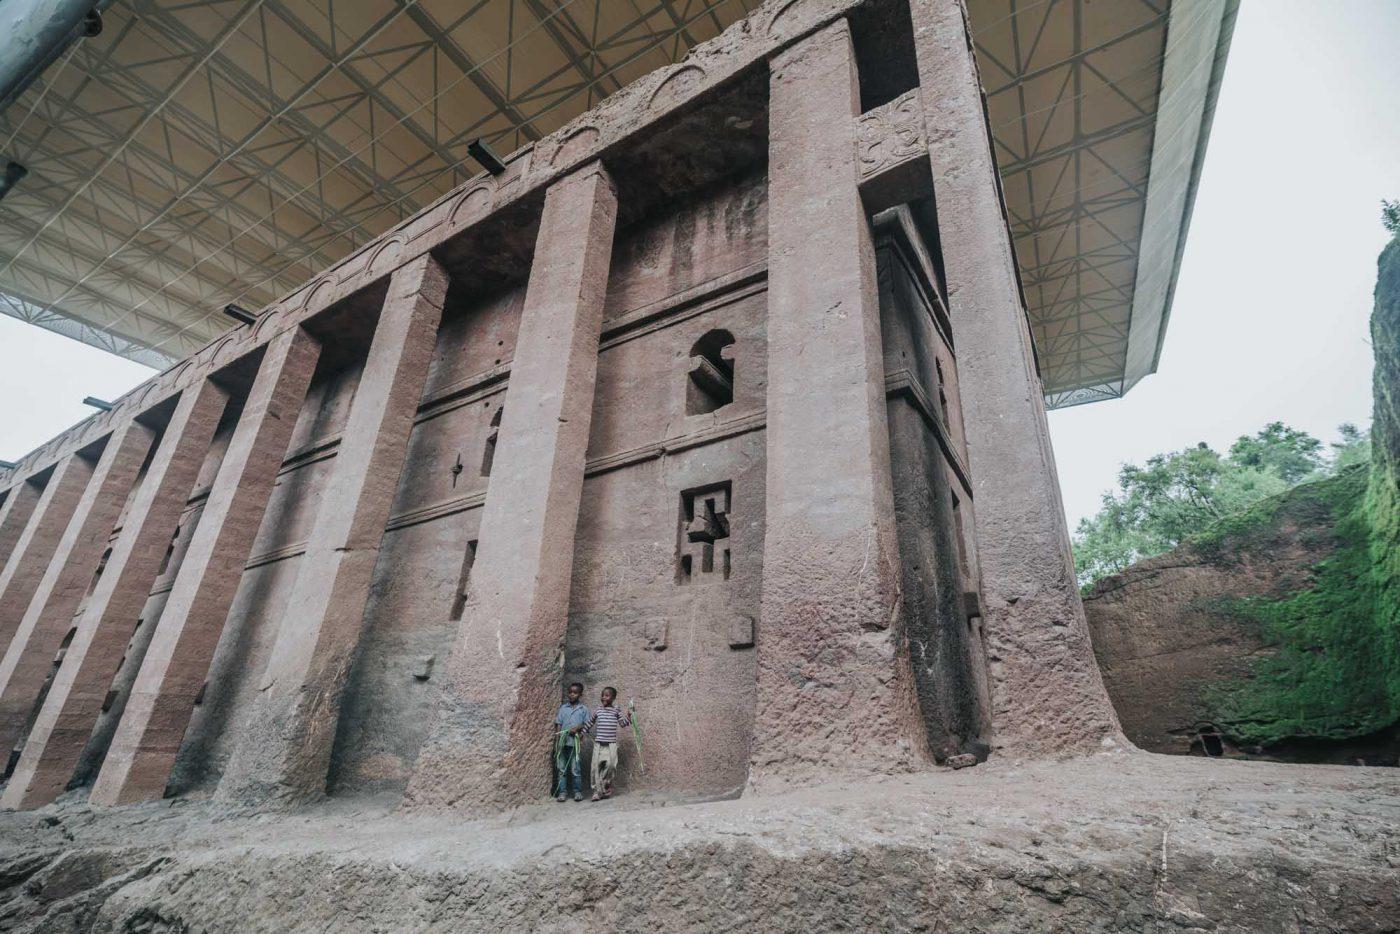 Biete Medhane Alem Church, Lalibela, Ethiopia